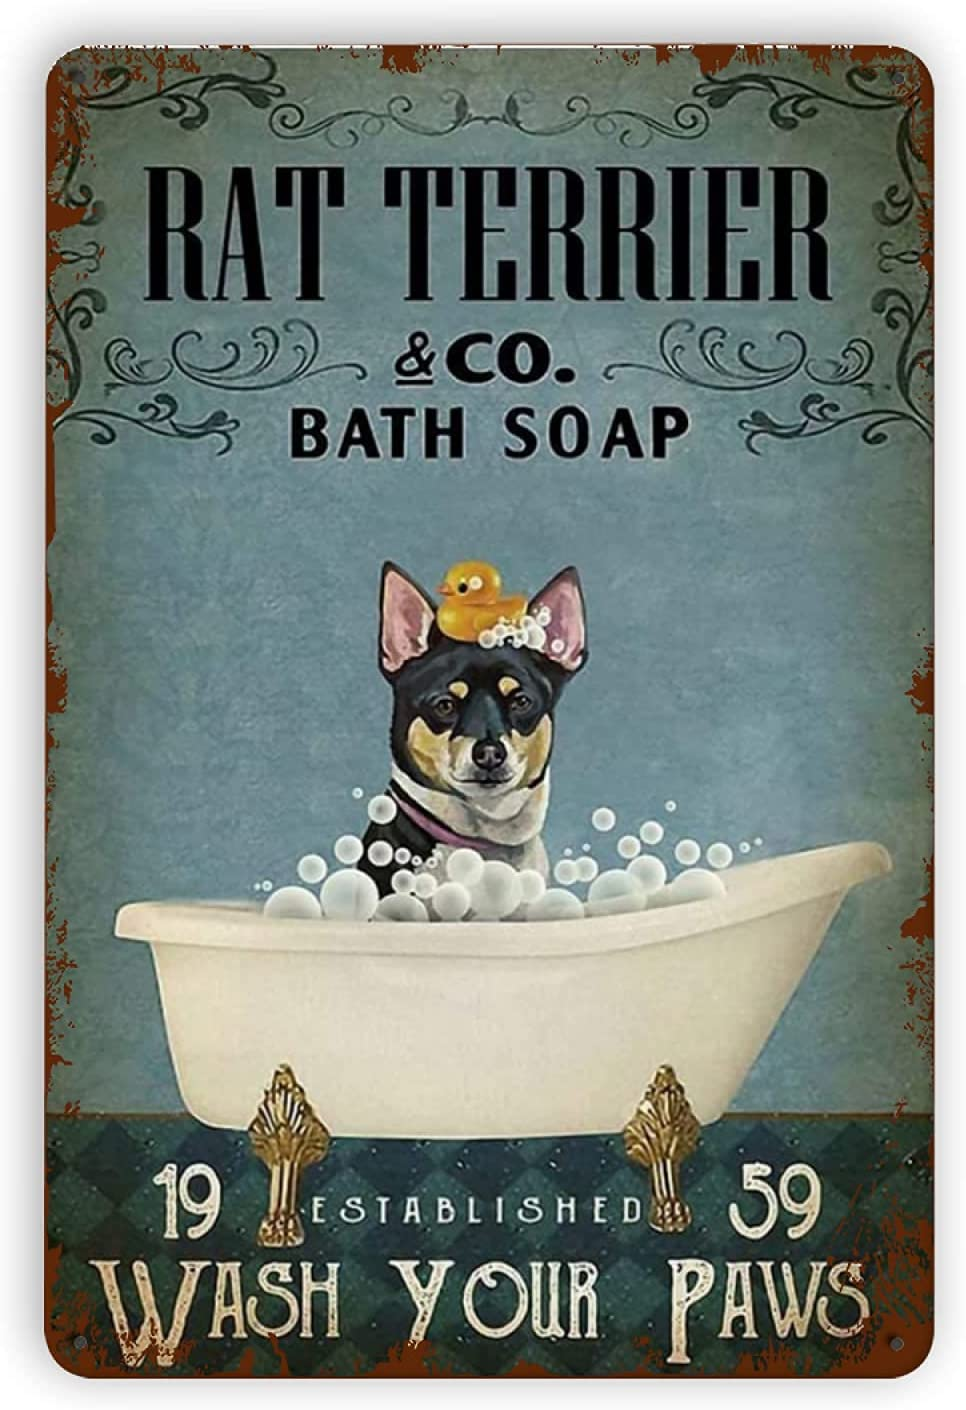 Wall Decor Dog Rat Terrier Bath Soap Metal Tin Signs Reproduction, Vintage Wall Decor Retro Art Tin Sign Funny Decorations for Home Bar Pub Cafe Farm Room Metal Plaque Classic Poster 12×16 Inch